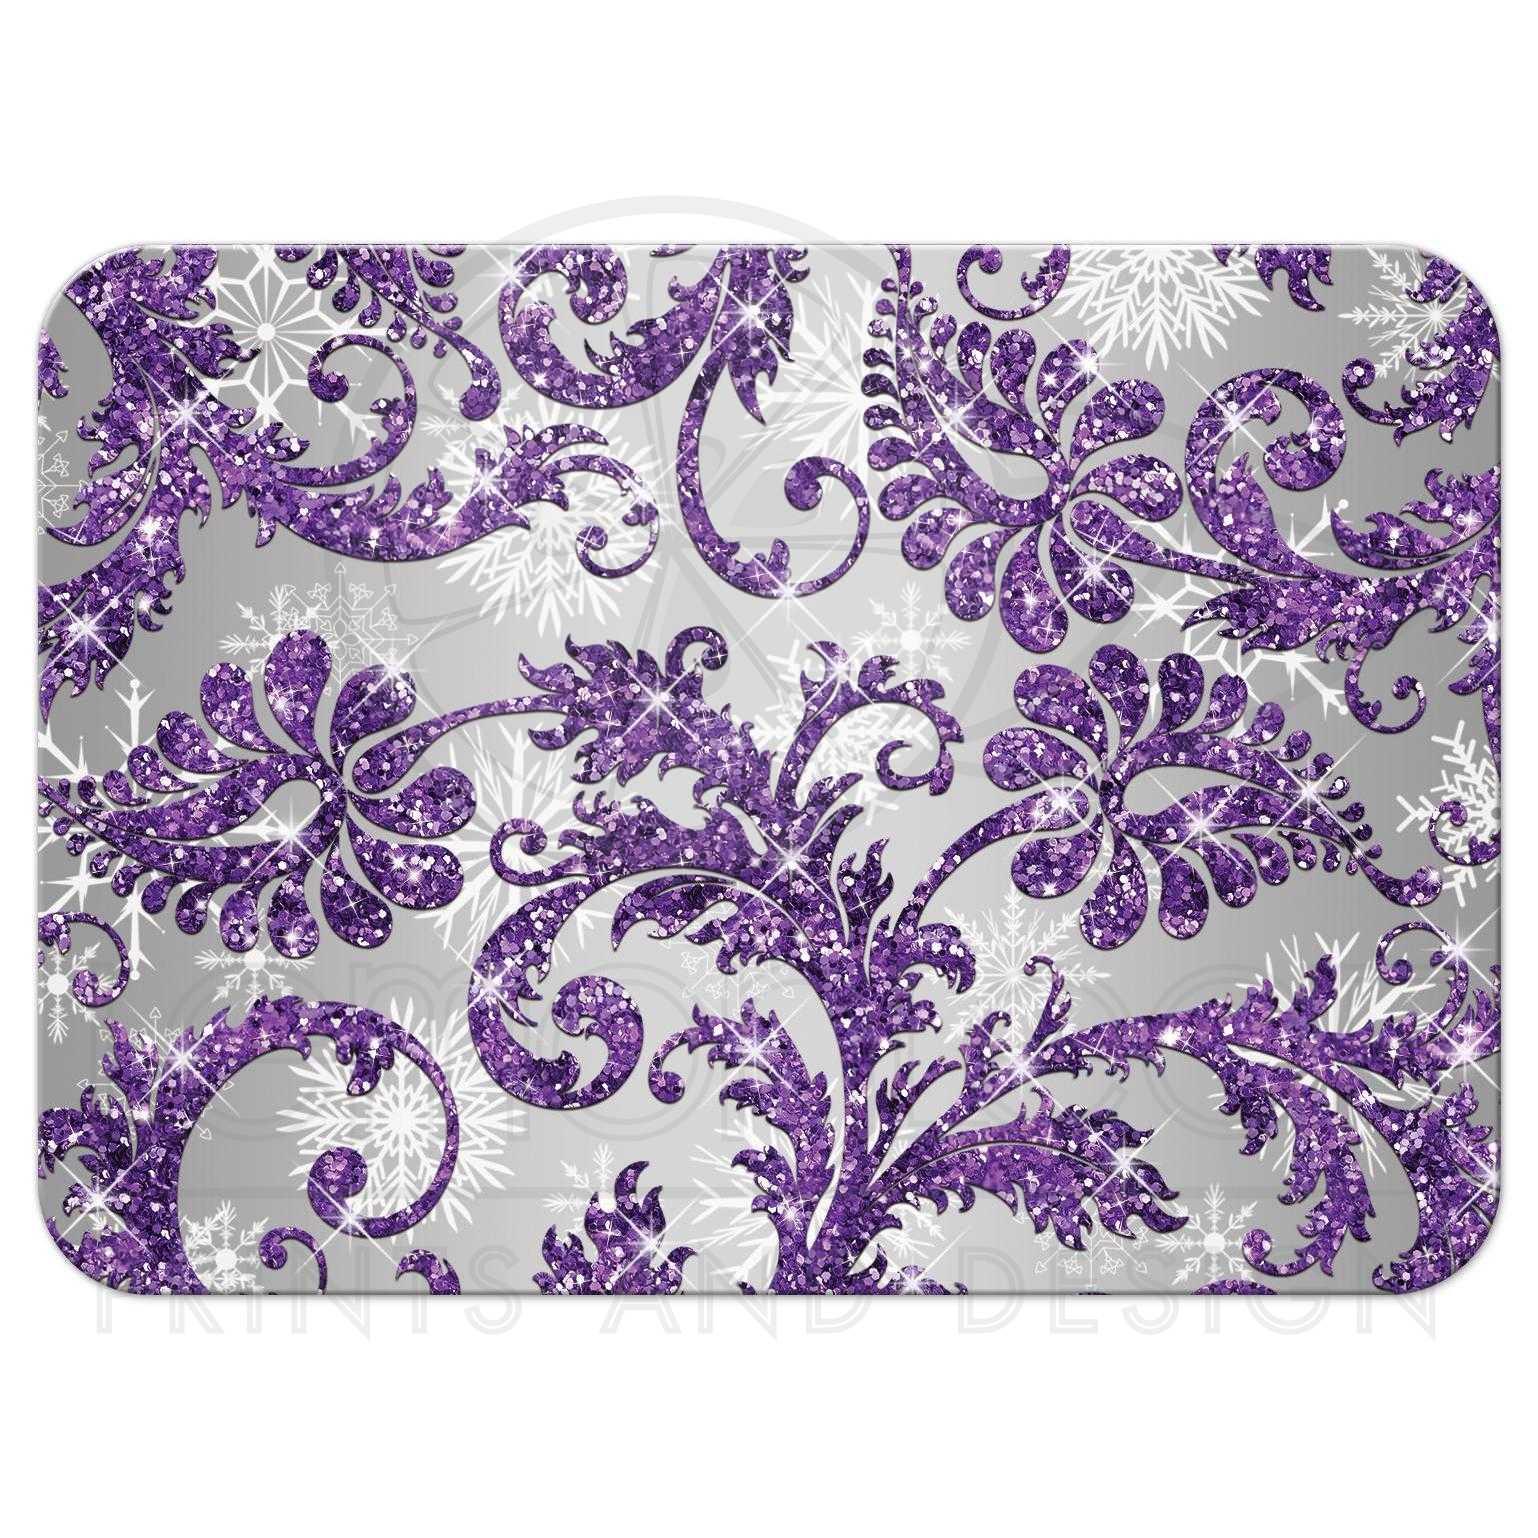 Winter wonderland wedding rsvp card 2 purple silver for Purple and silver wallpaper